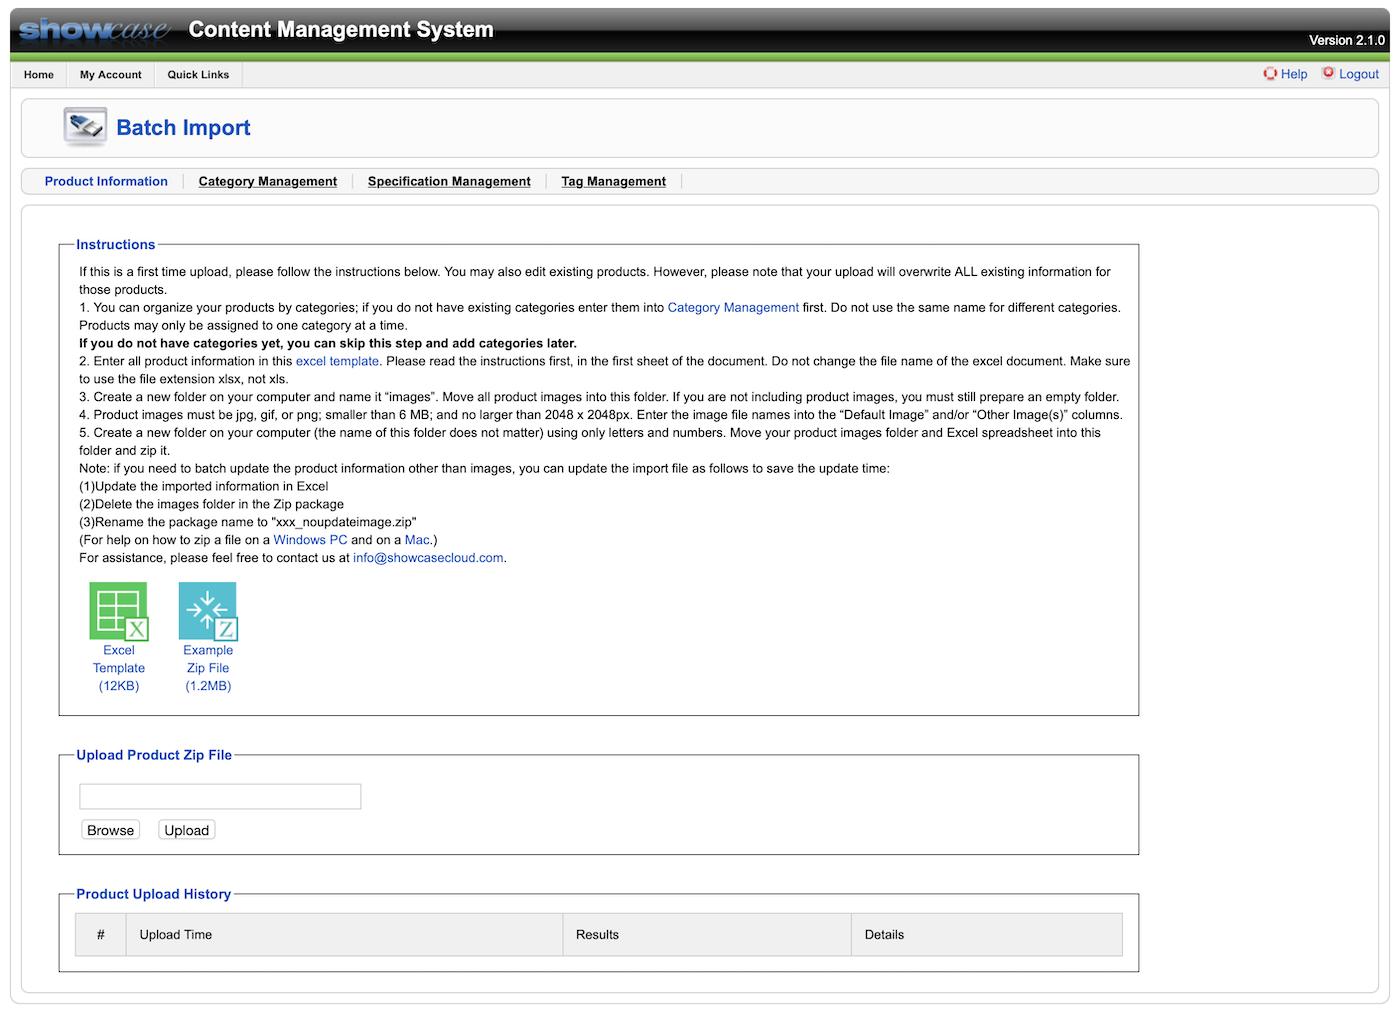 Showcase CMS batch import